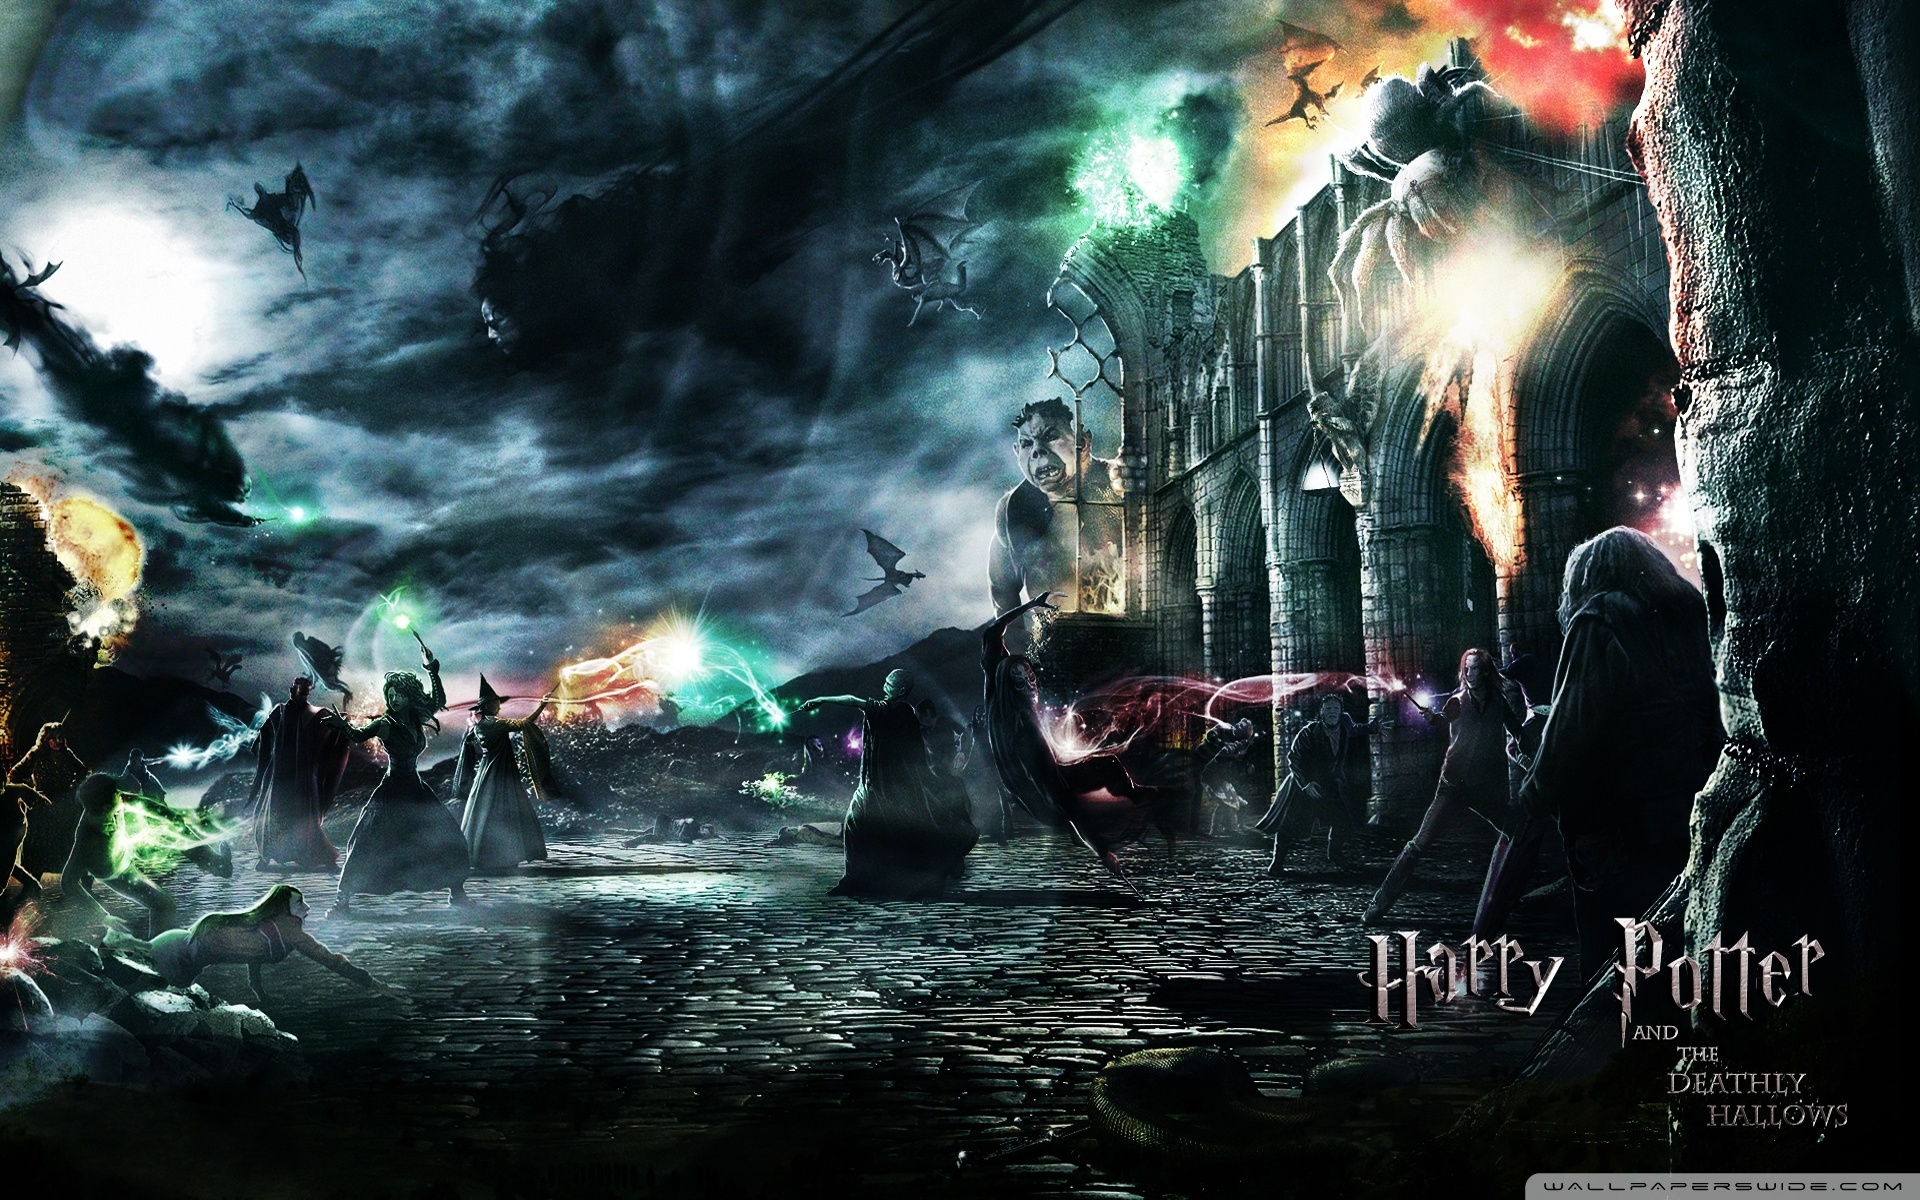 Harry Potter Hogwarts Wallpaper Deathly wallpapers wallpaperup 1920x1200